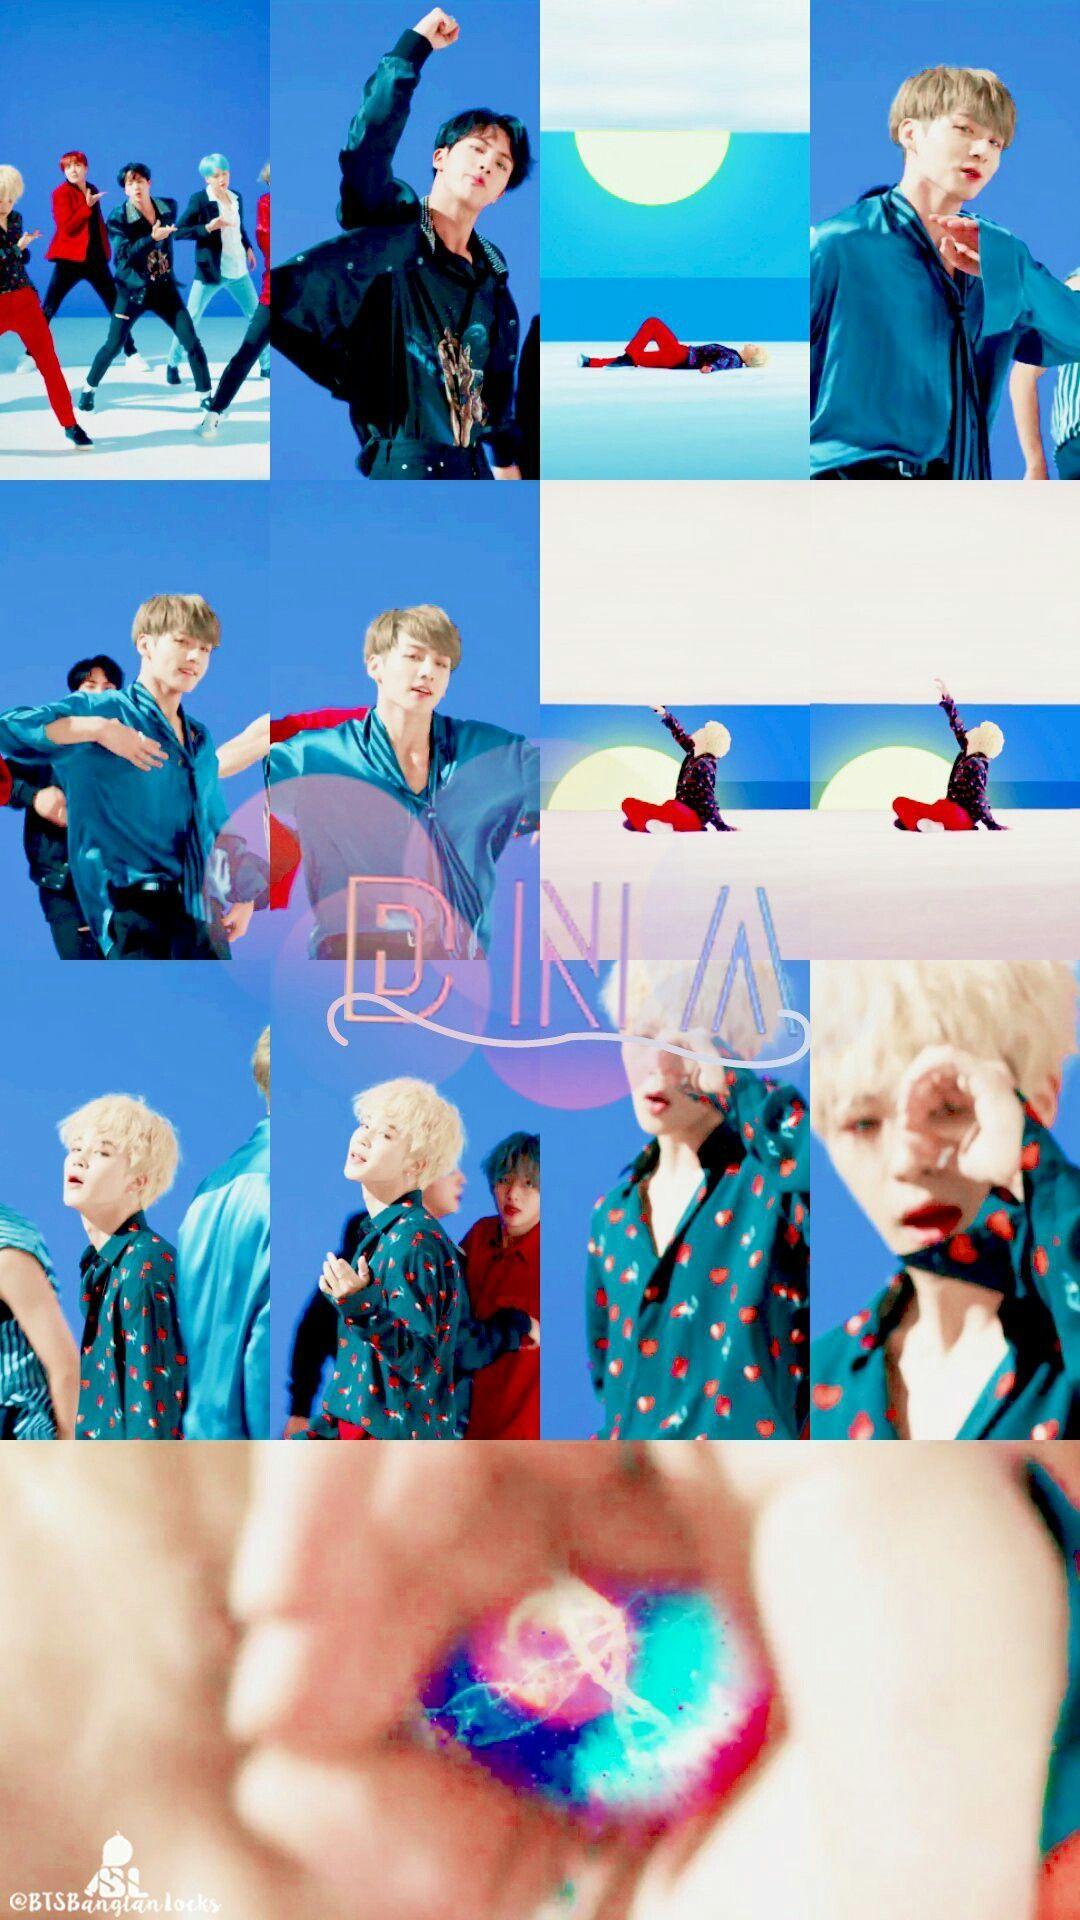 Bts dna || wallpaper ♡ | BTS ♥ | Pinterest | BTS and Exo